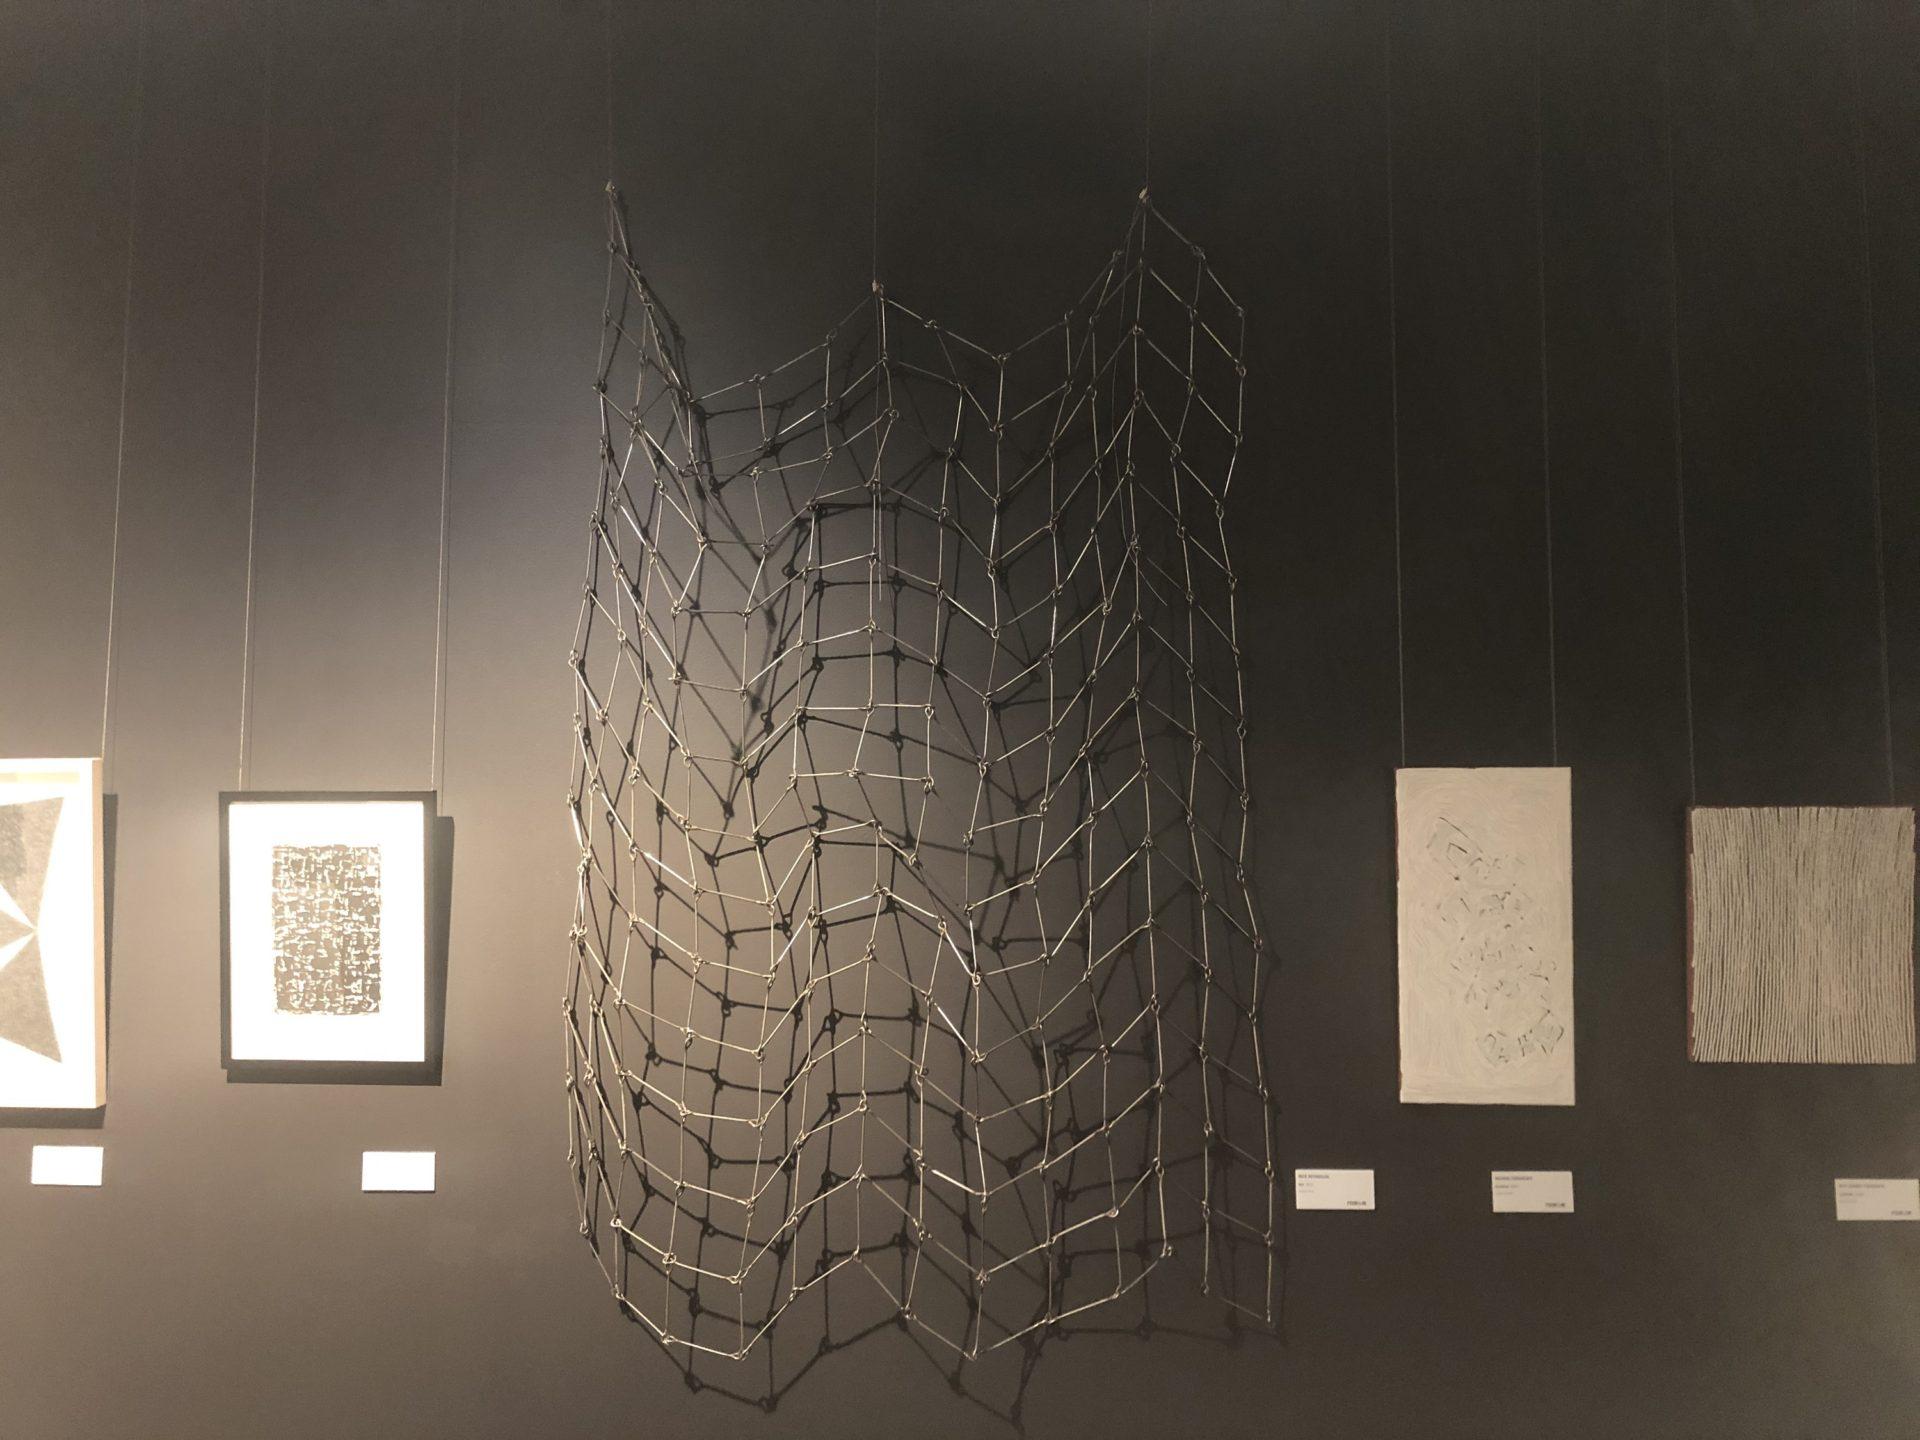 'Net' by Rick Reynolds 2012